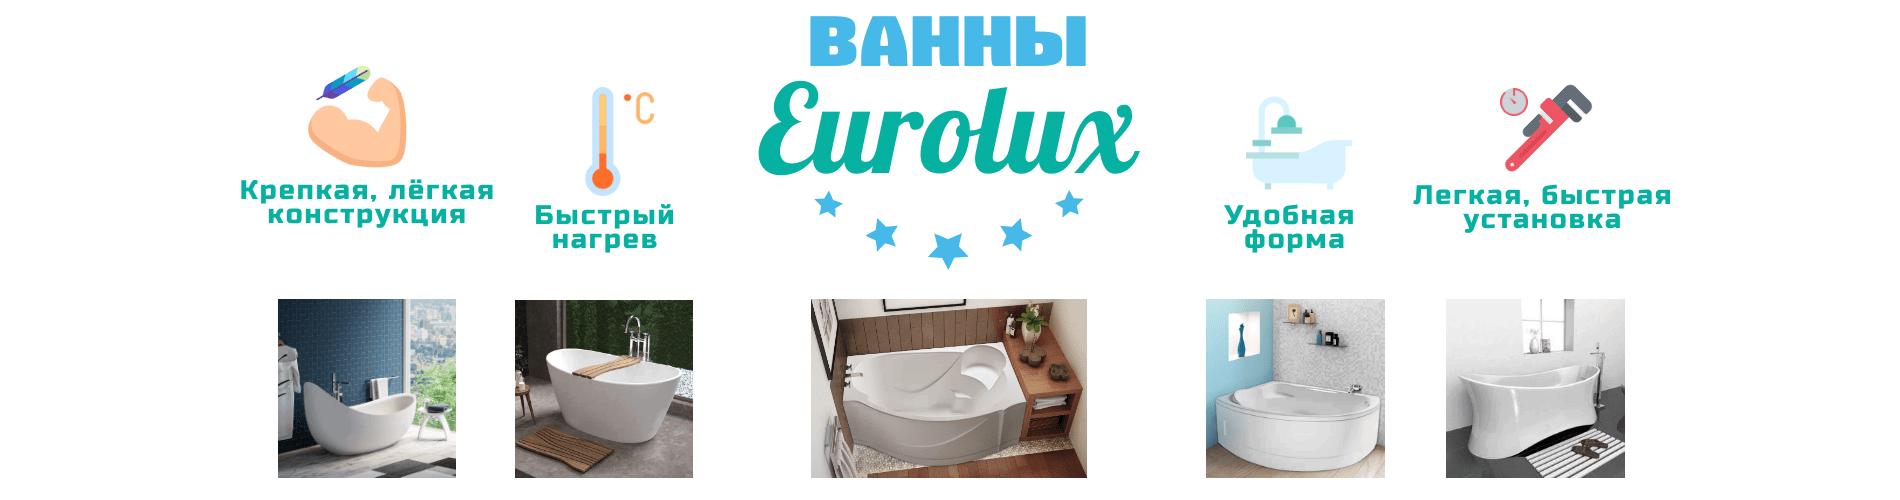 Eurolux bathubs